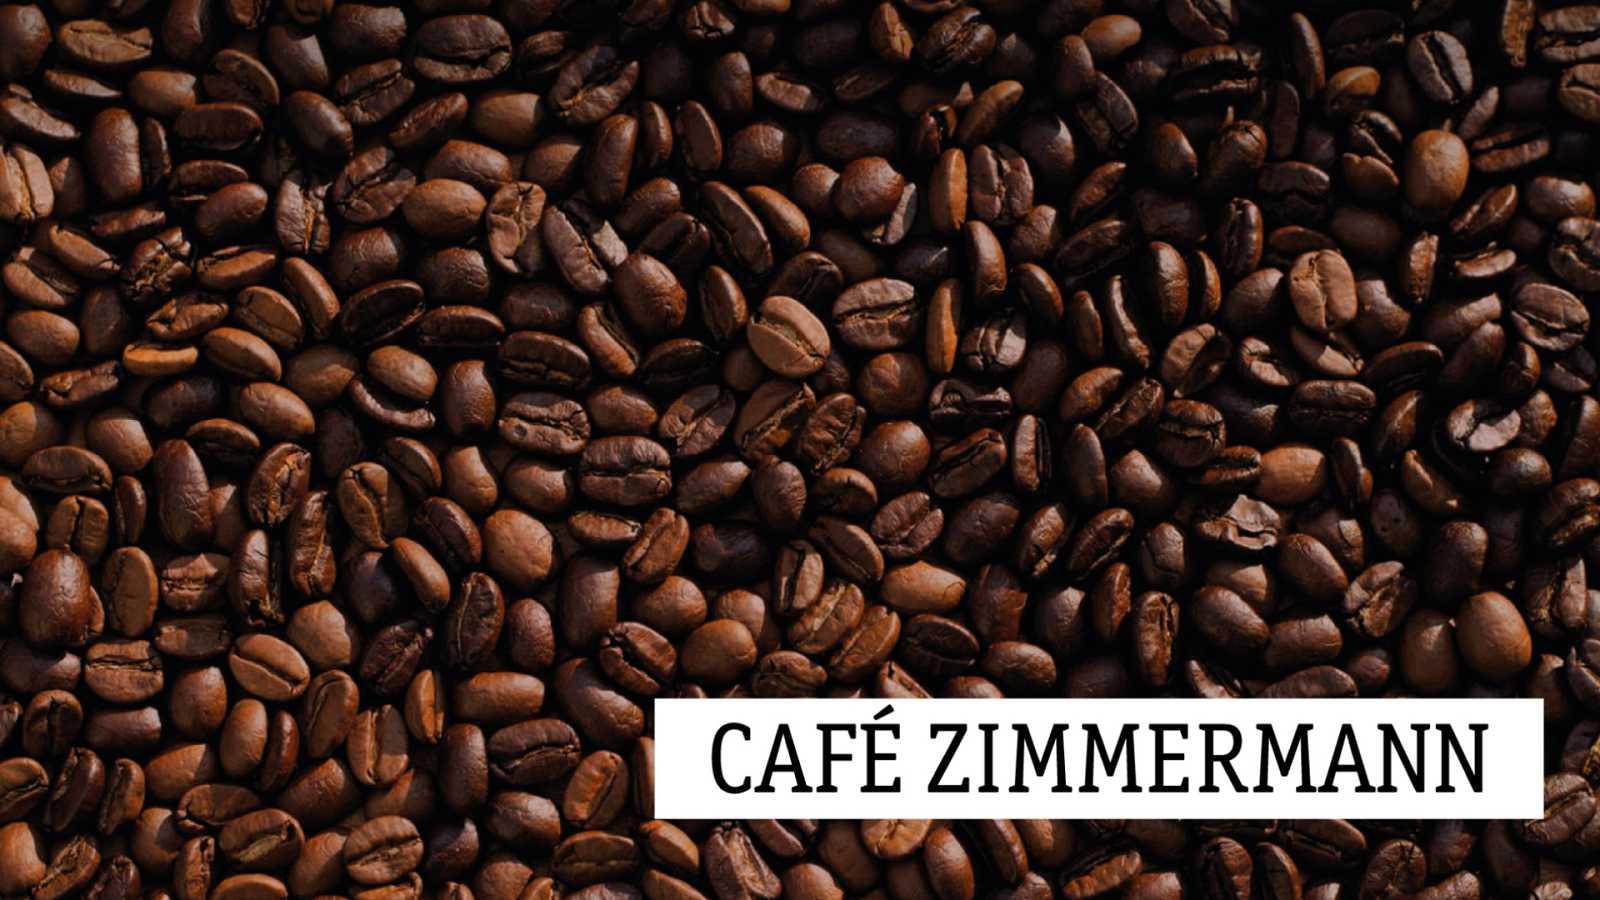 Café Zimmermann - La voz humana - 25/11/20 - escuchar ahora